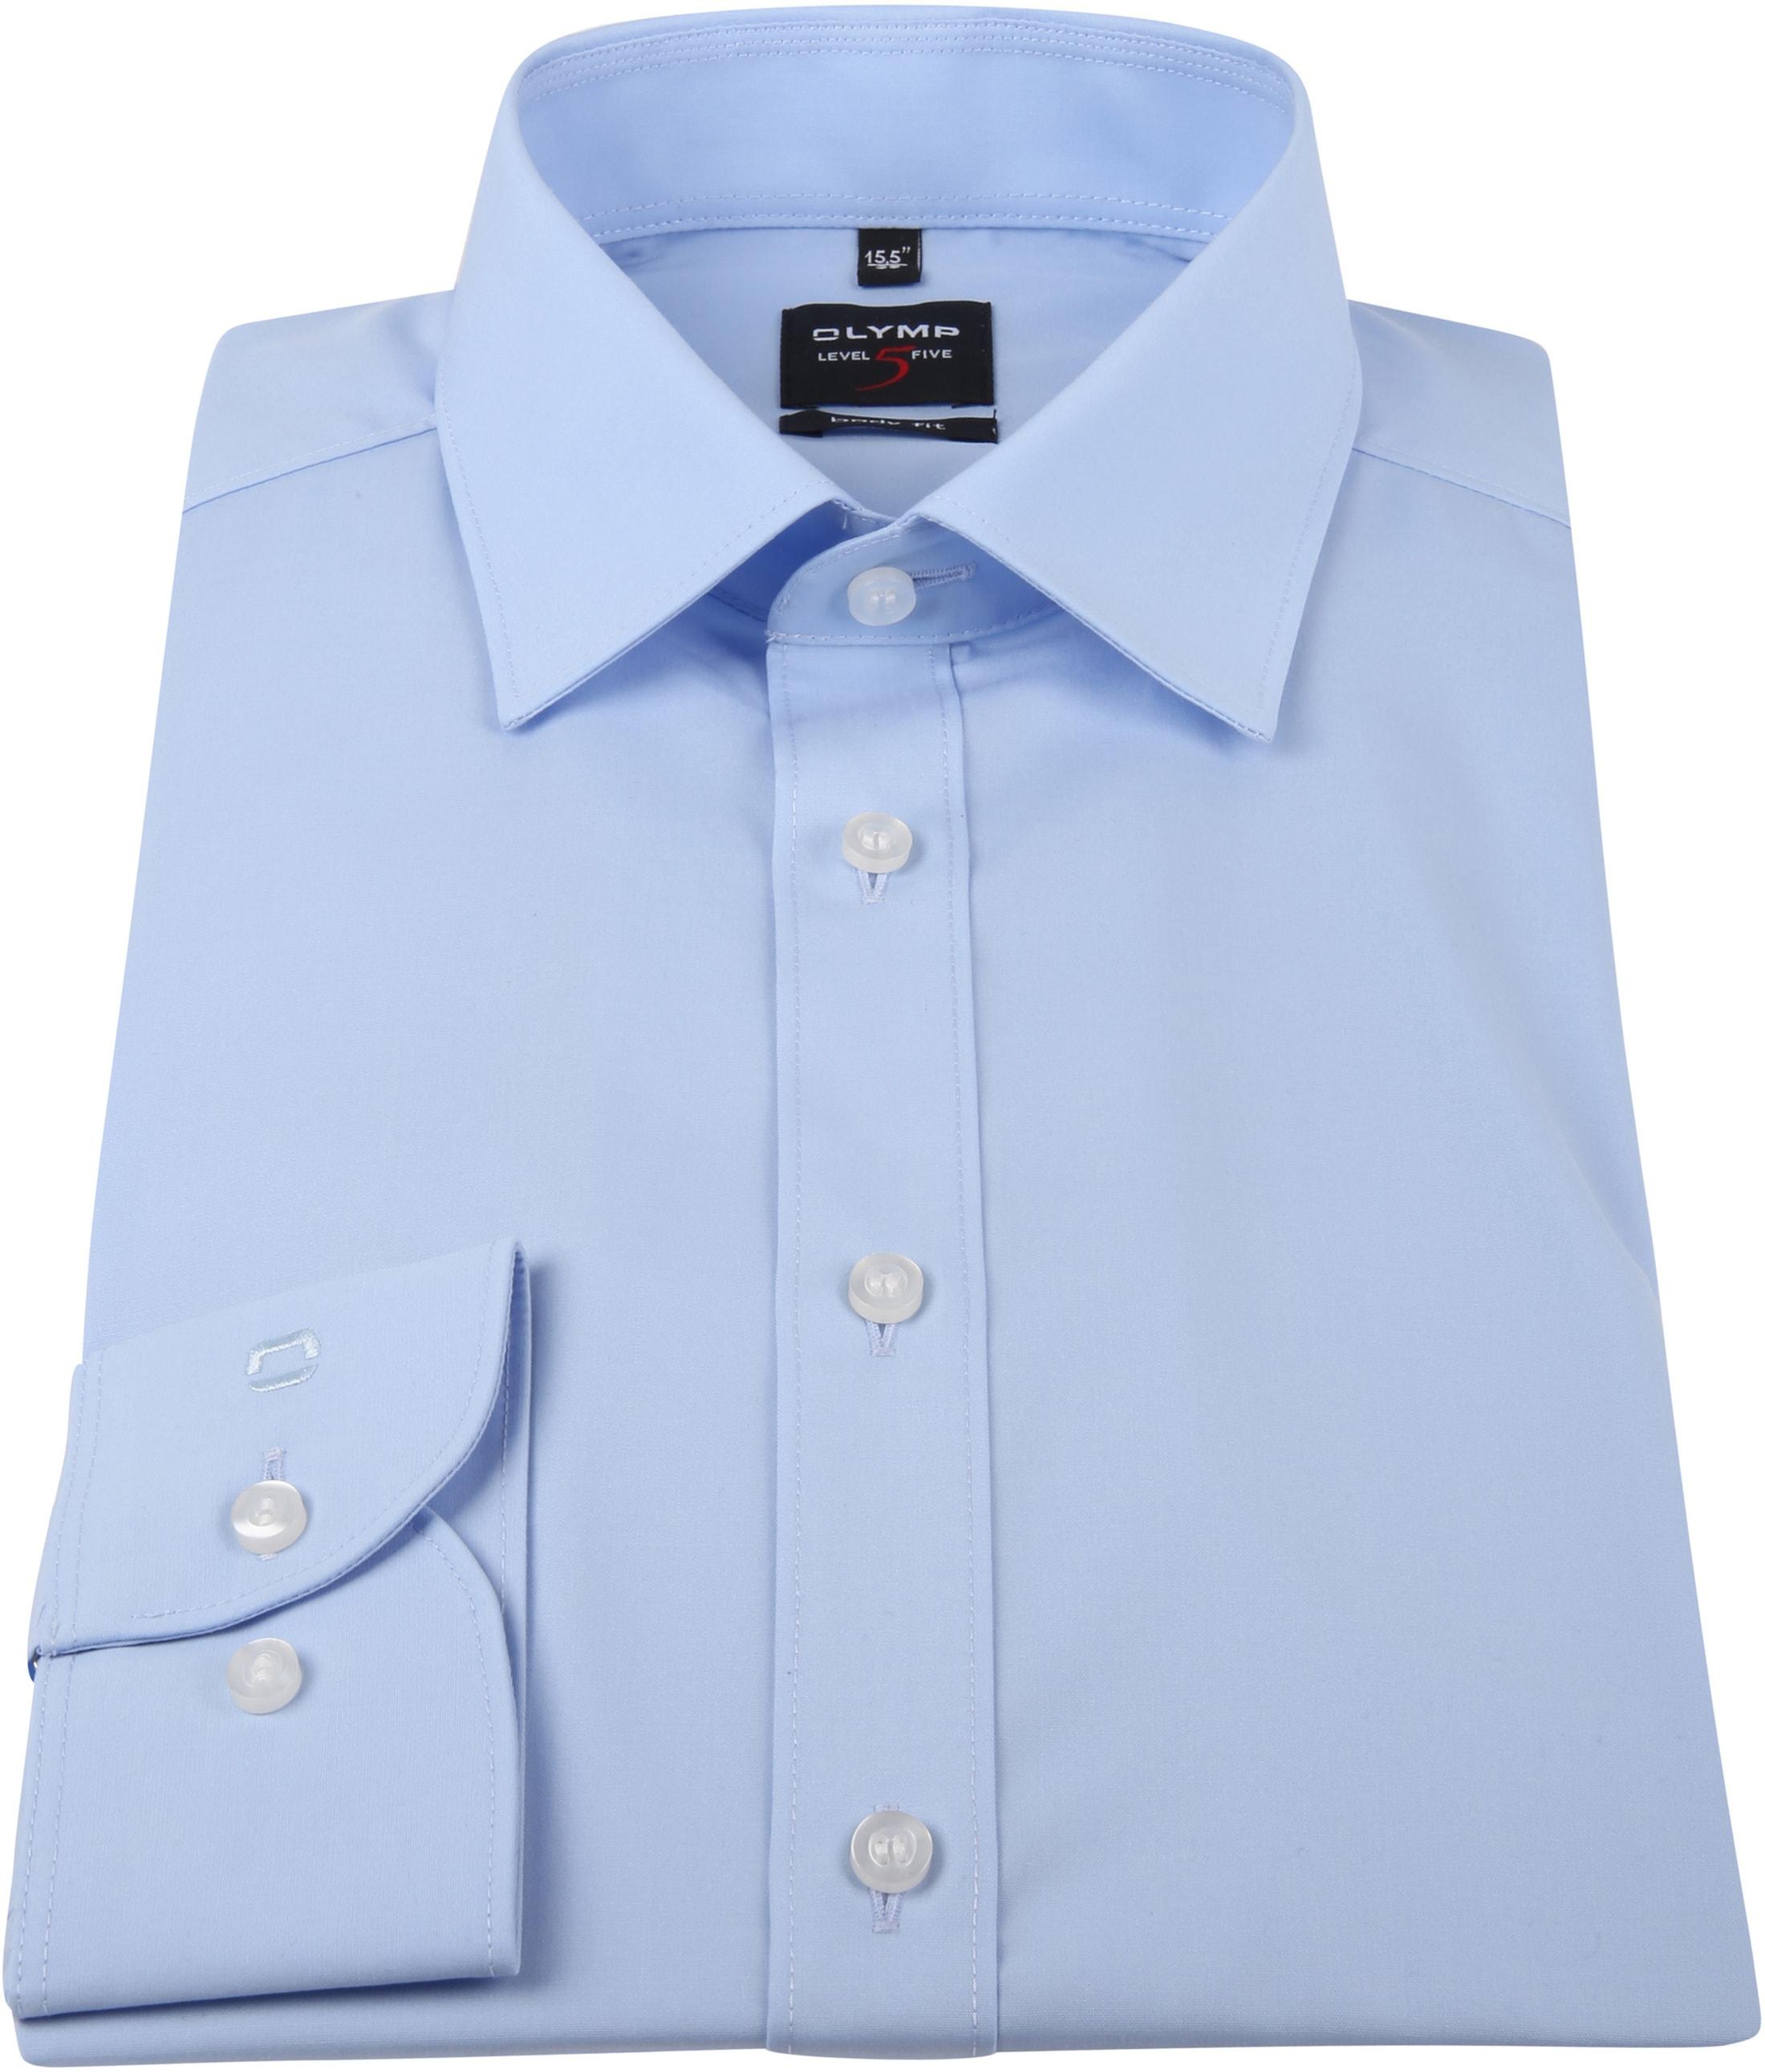 OLYMP Overhemd Blauw Body Fit foto 2